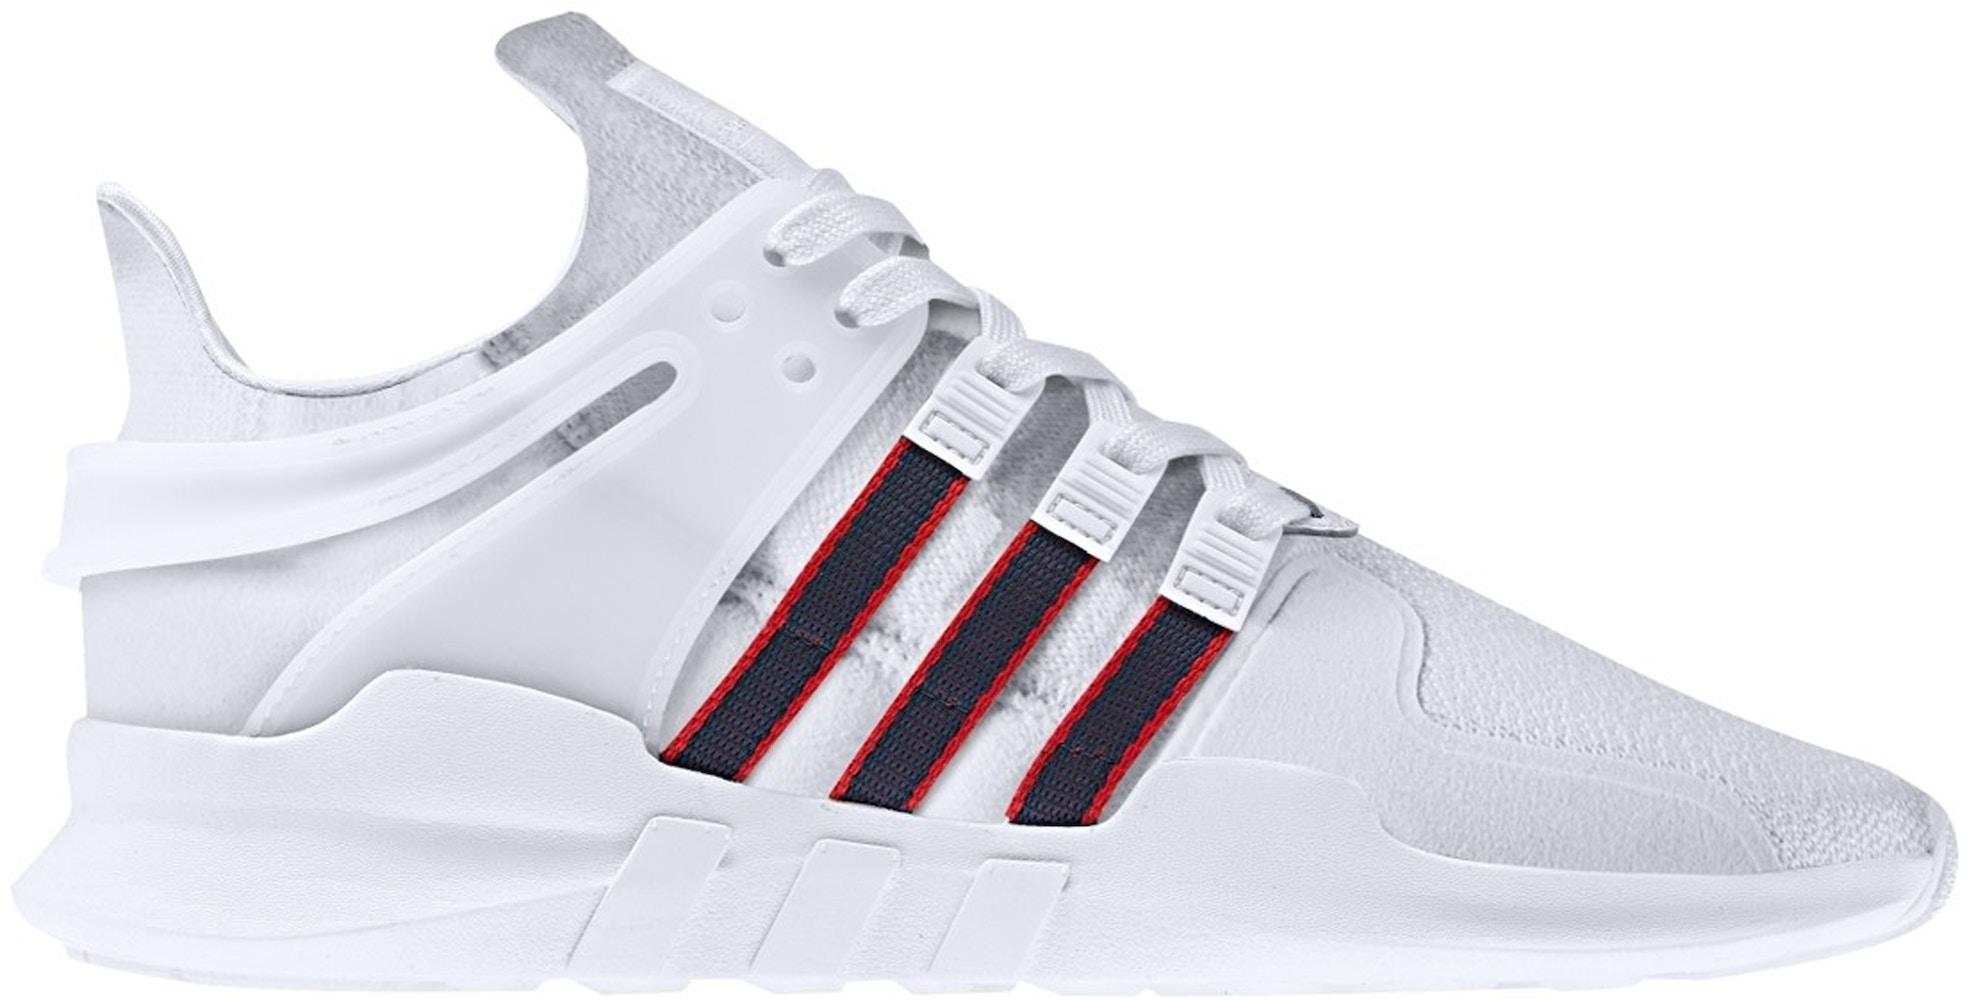 adidas EQT Support Adv White Navy Scarlet